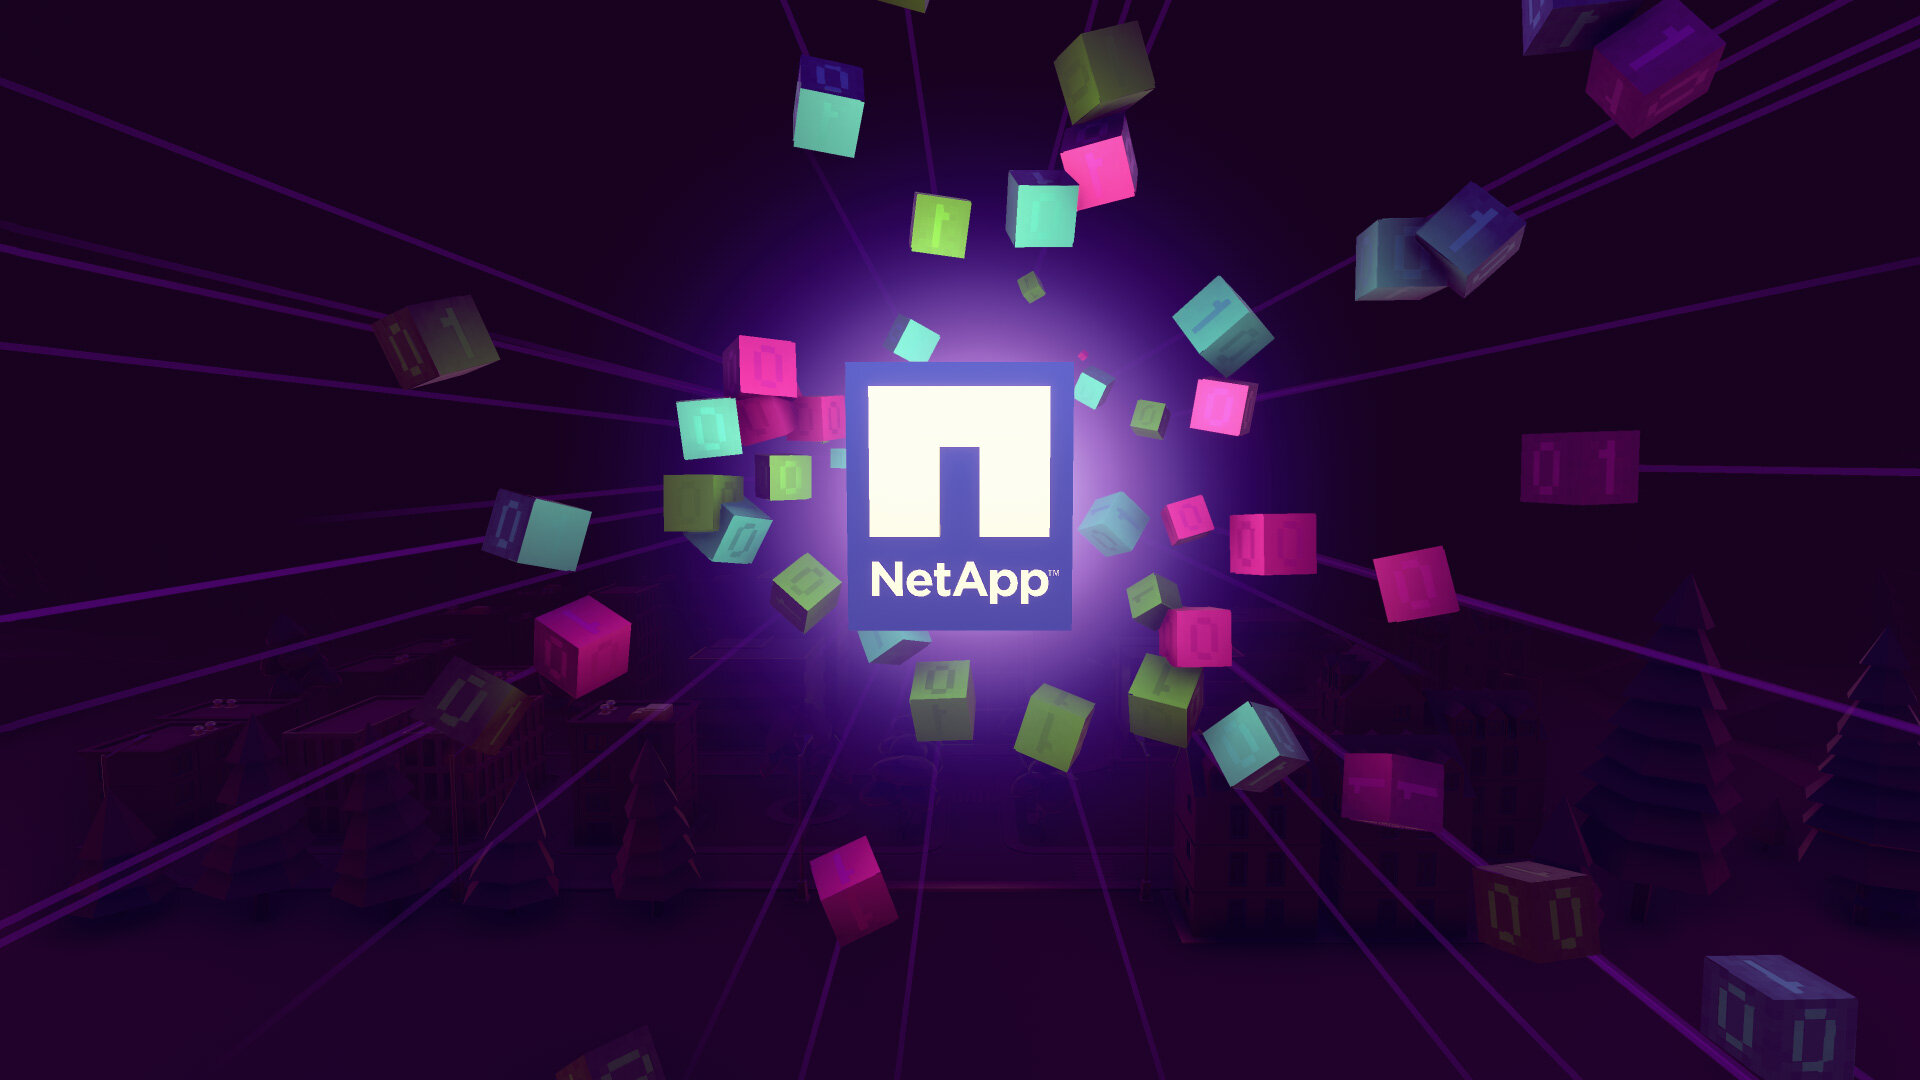 NetAppVR_Intro.jpg